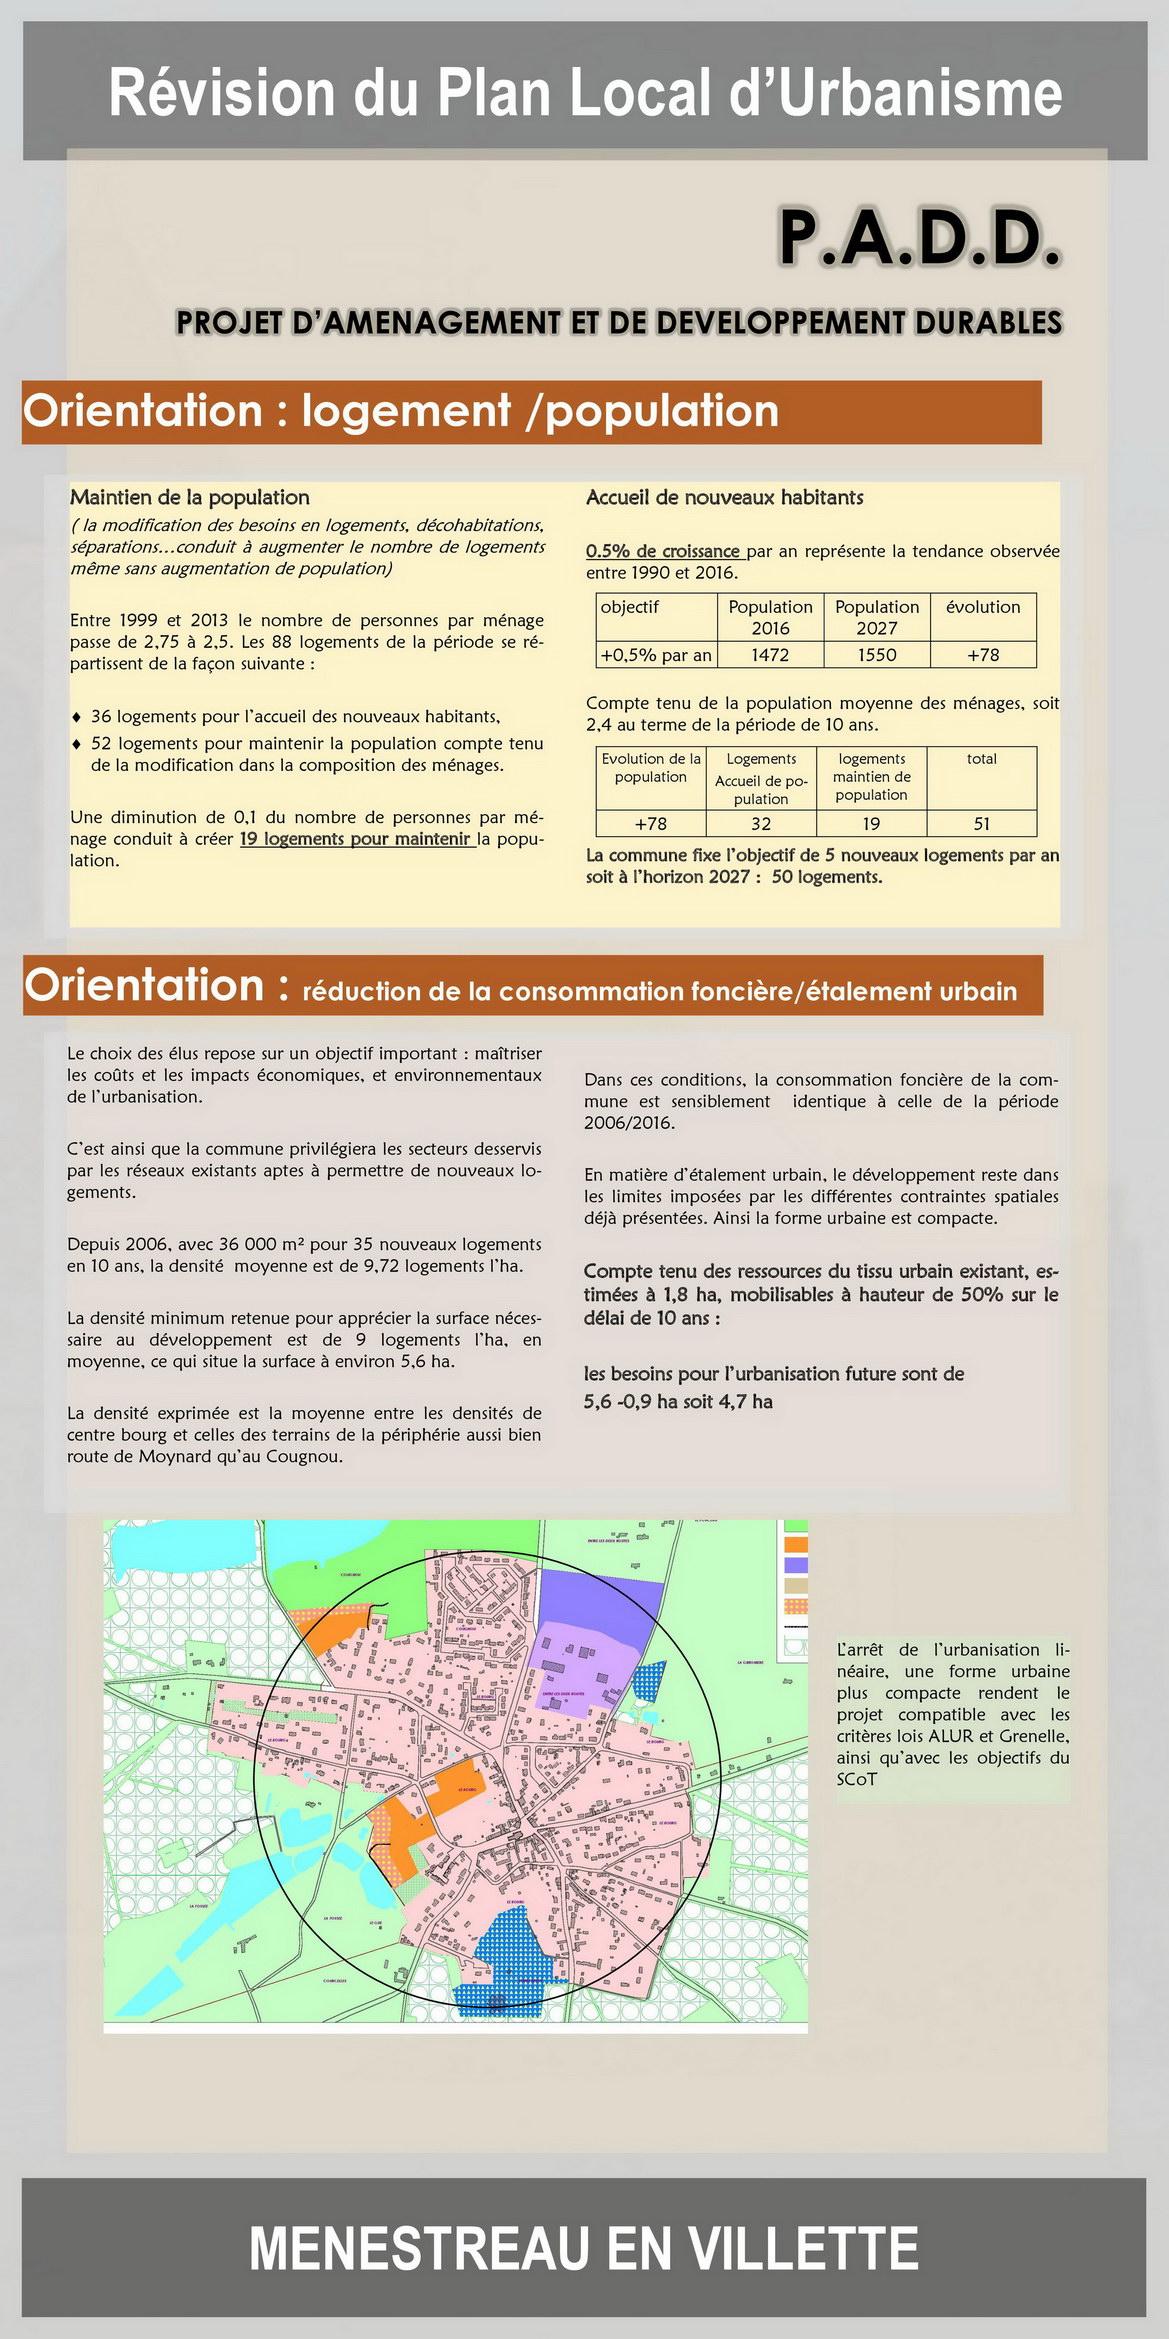 2-PADD ORIENTATIONS_redimensionner_redimensionner.jpg